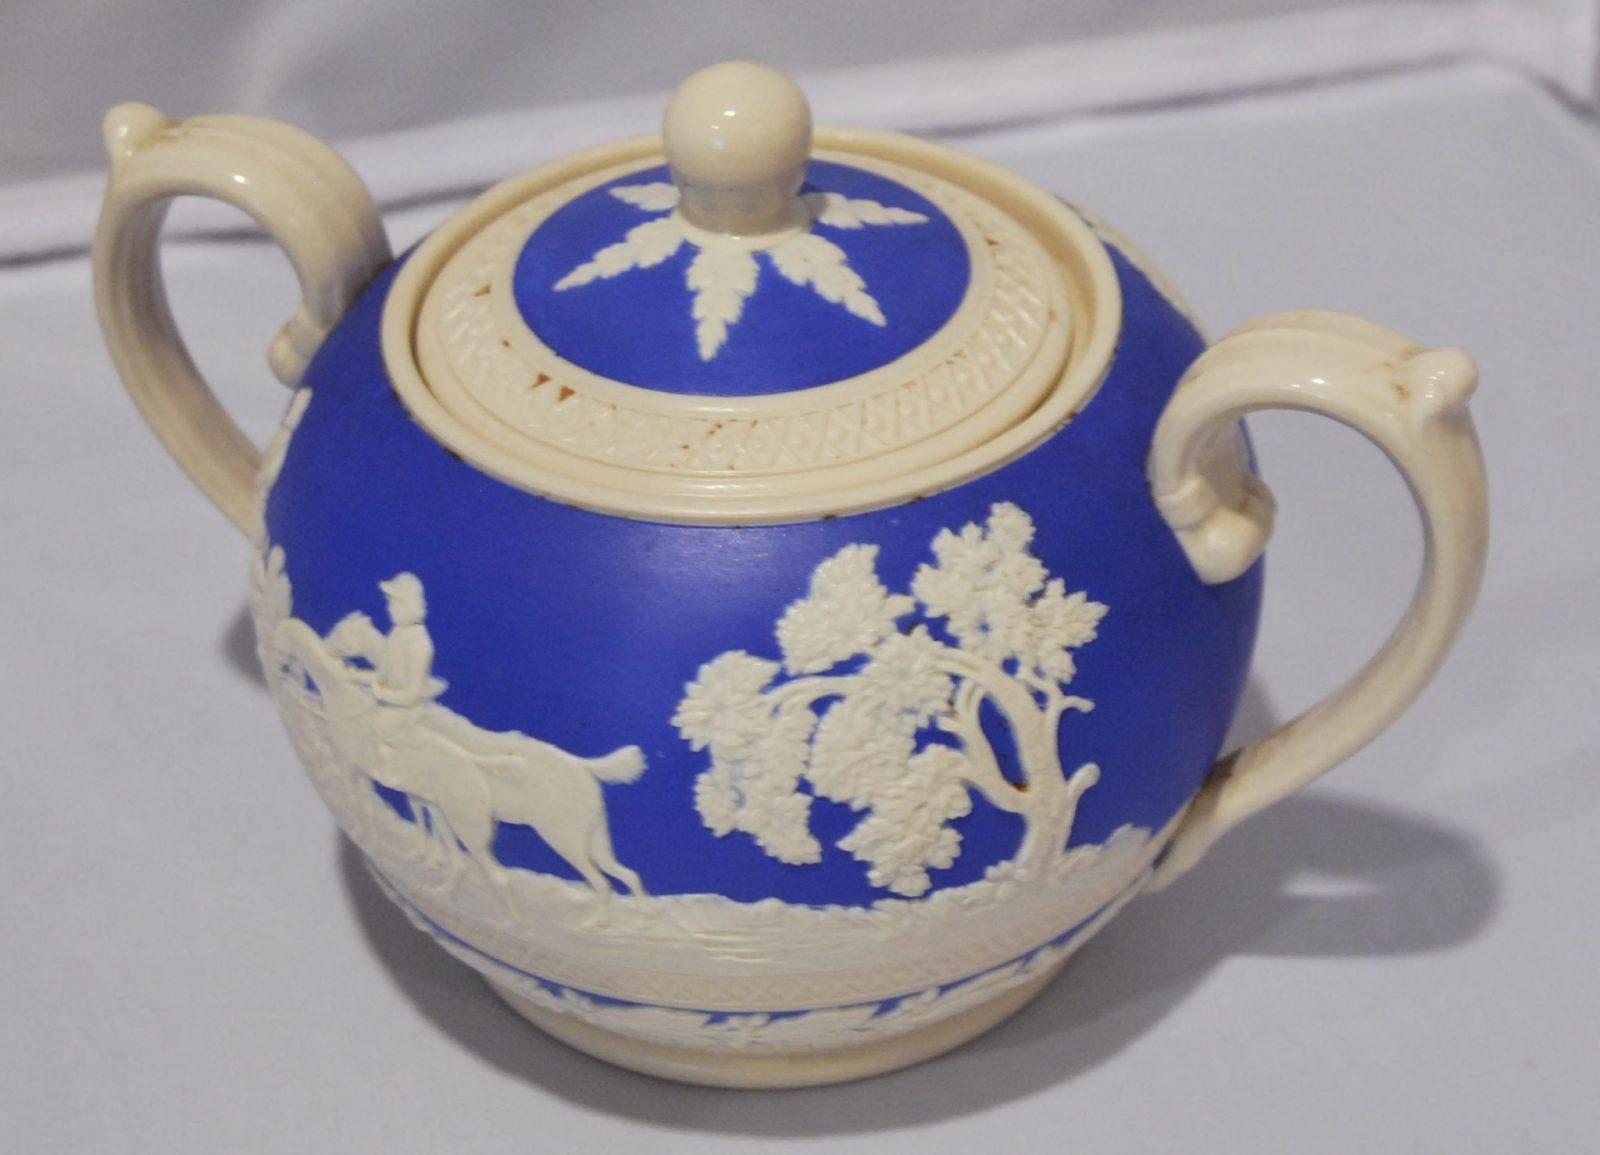 Antique Spode Copeland Blue Jasperware Sugar Container